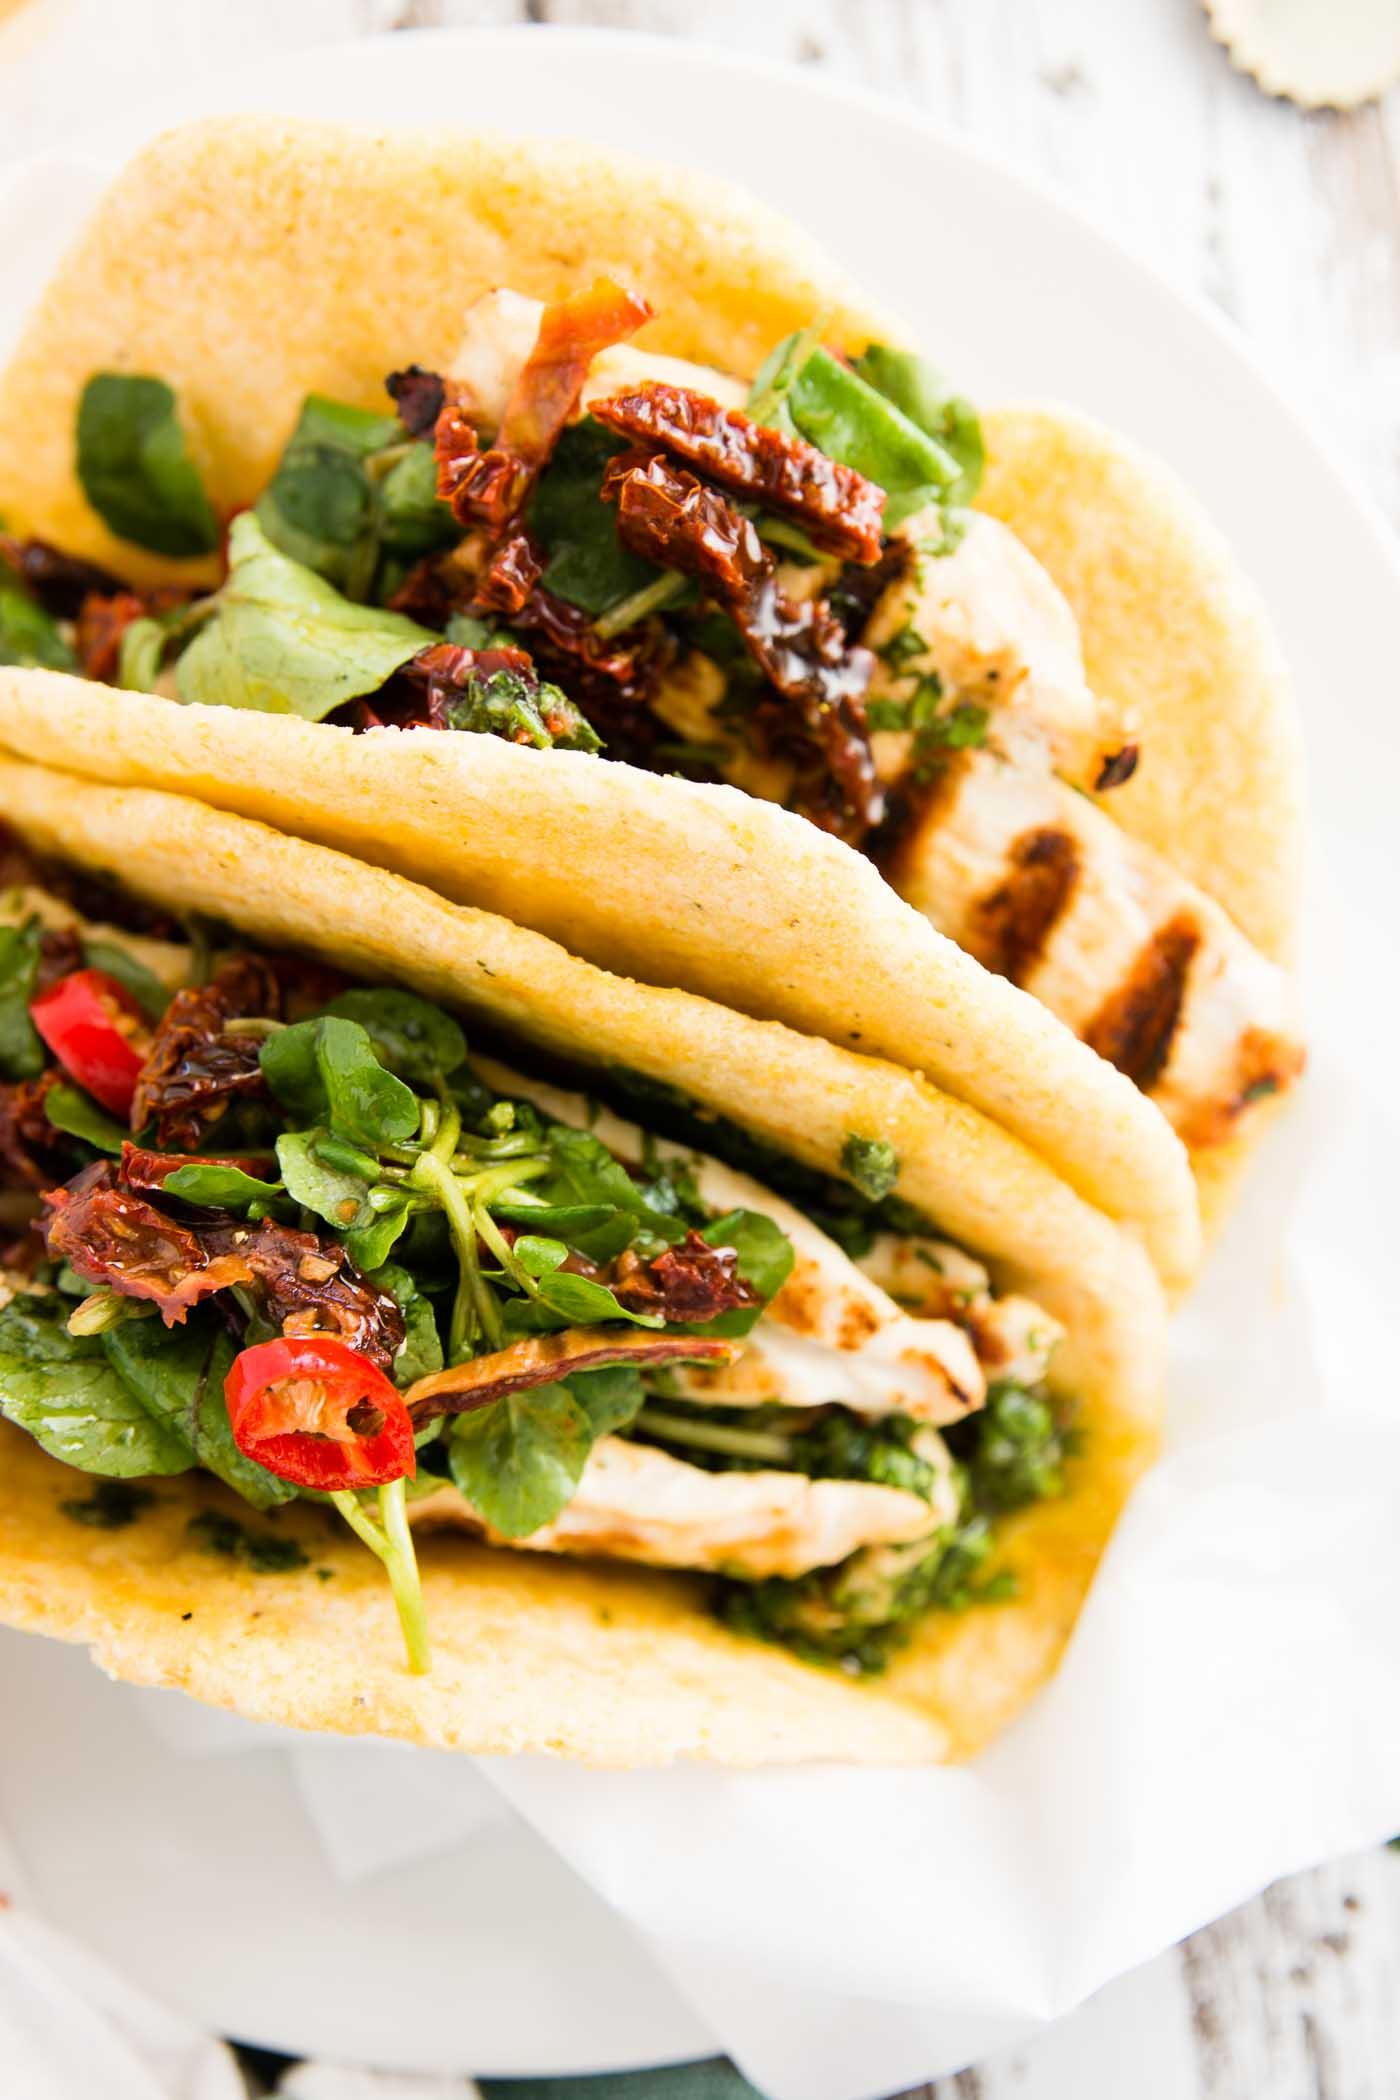 Chimichurri-Chicken-Tacos-with-Sundried-Tomato-Salsa-Recipe-18